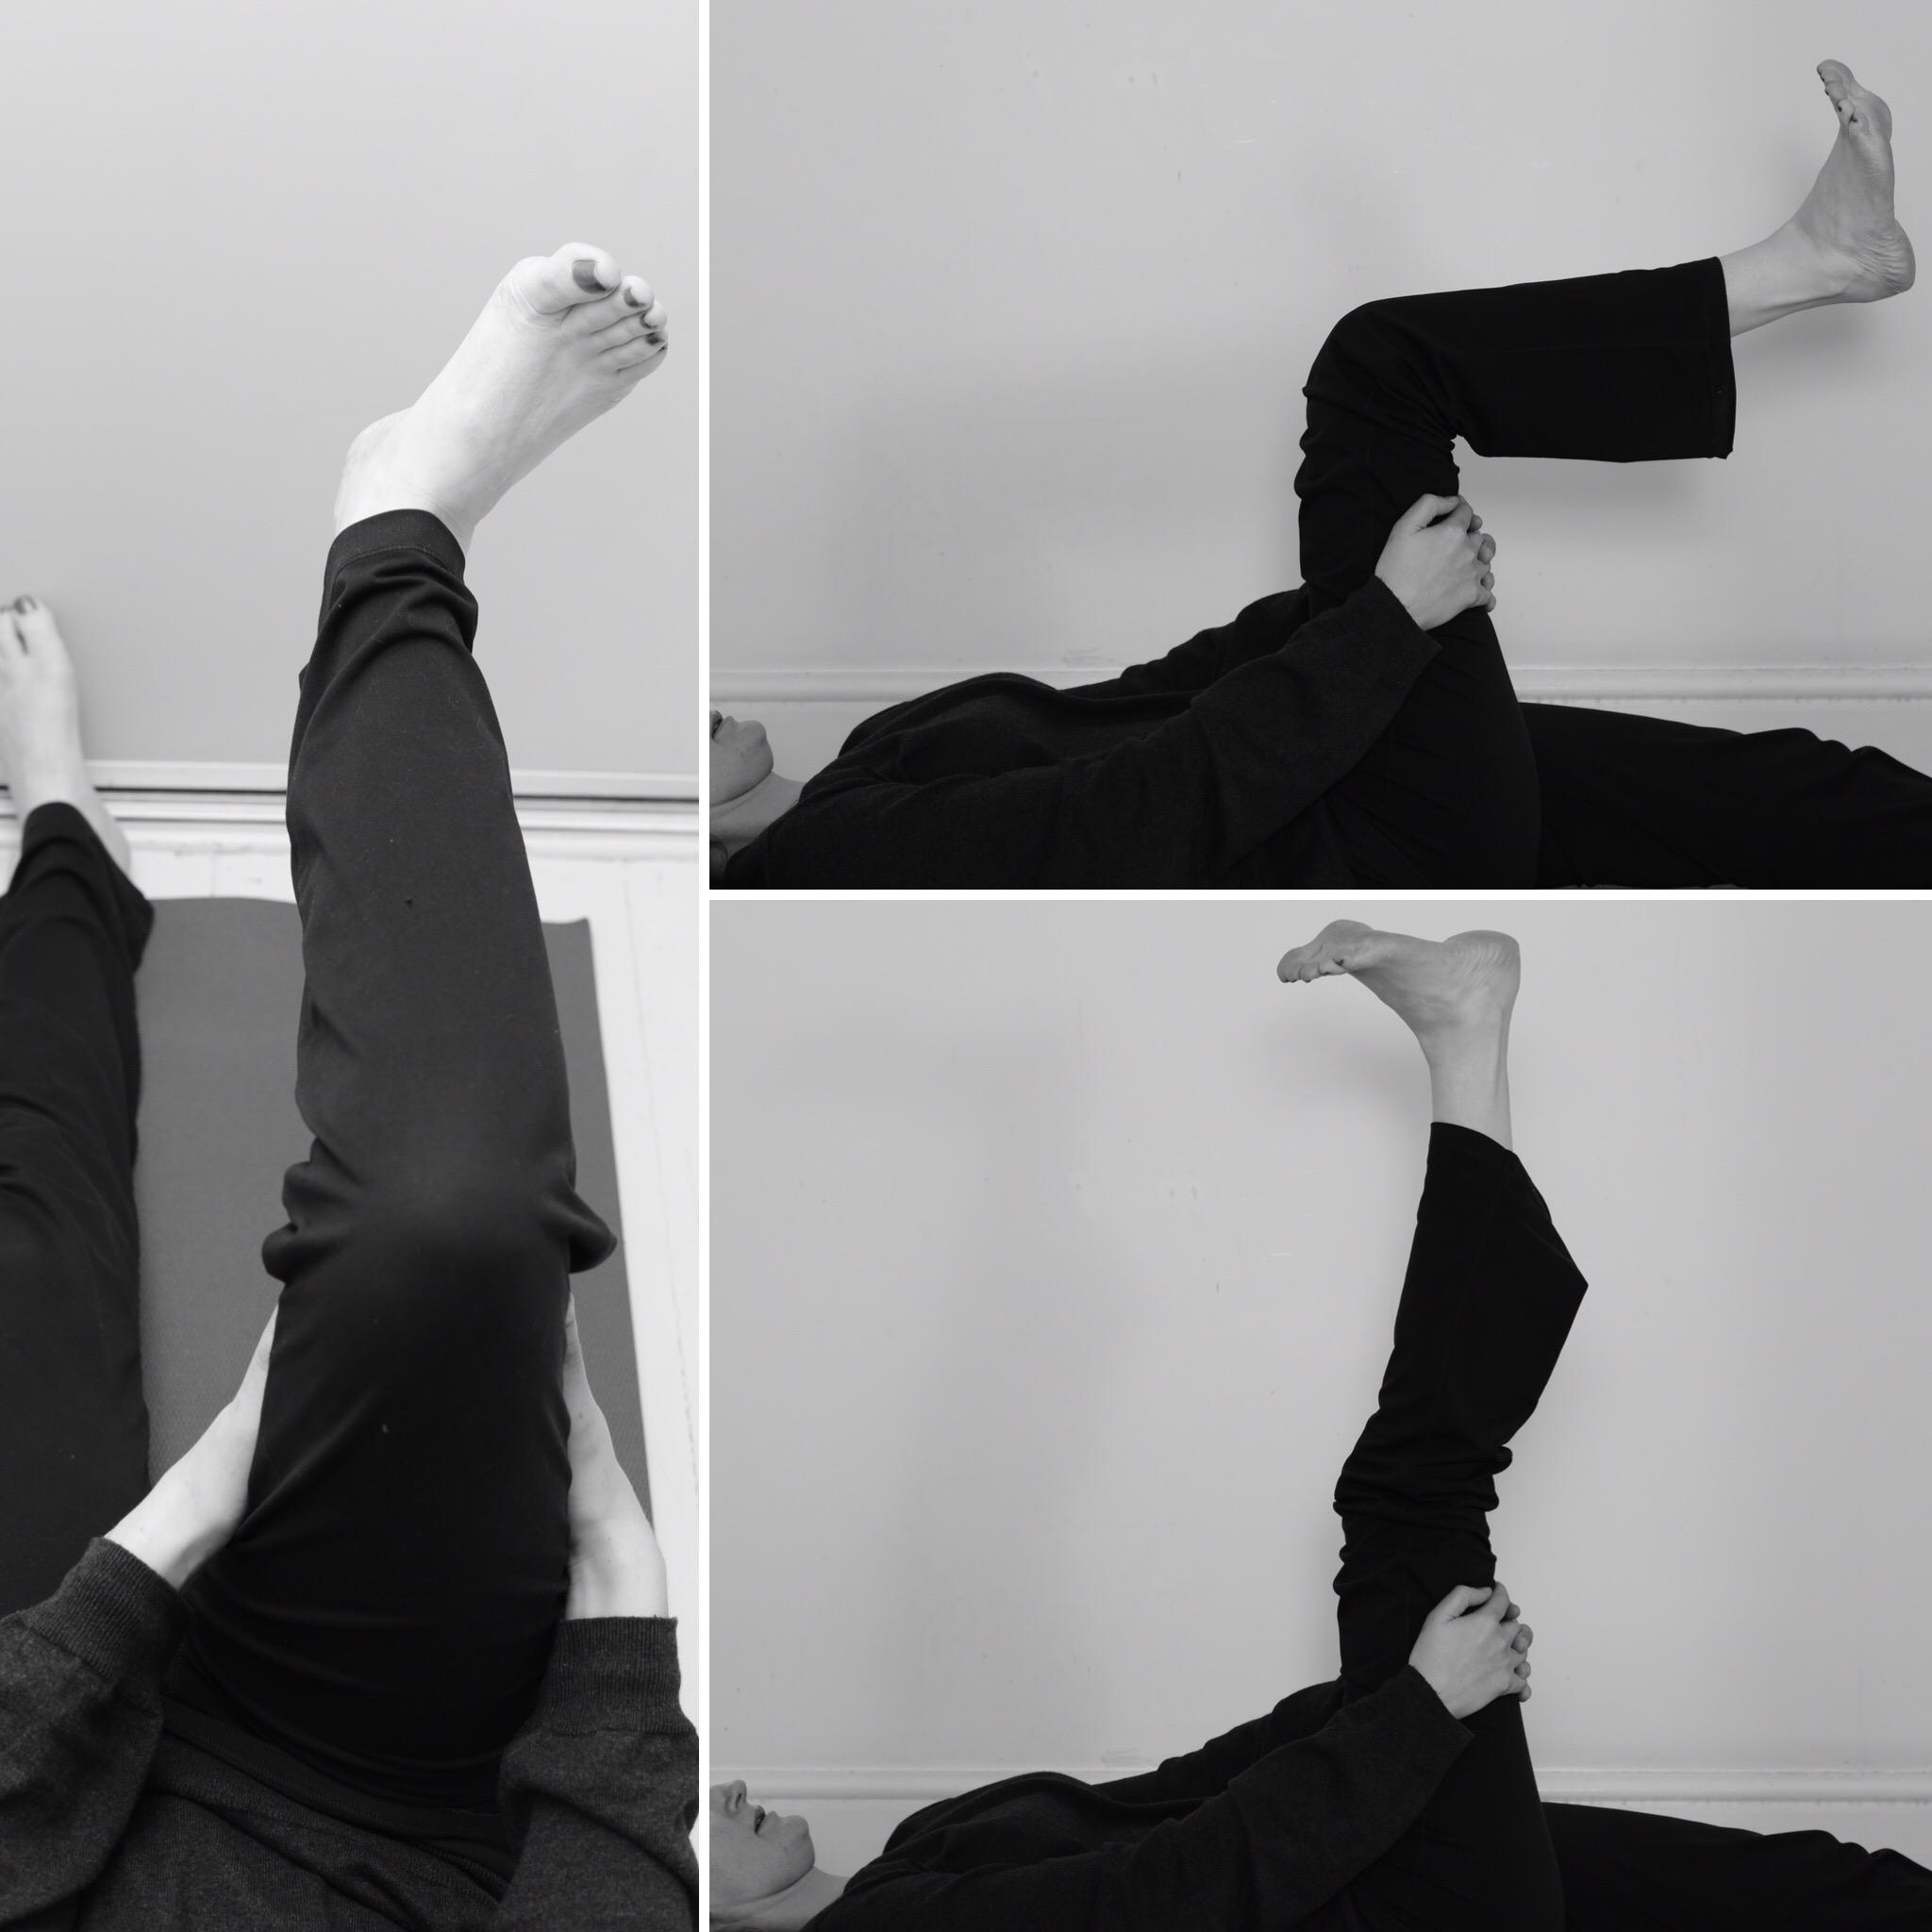 Nerve gliding exercise